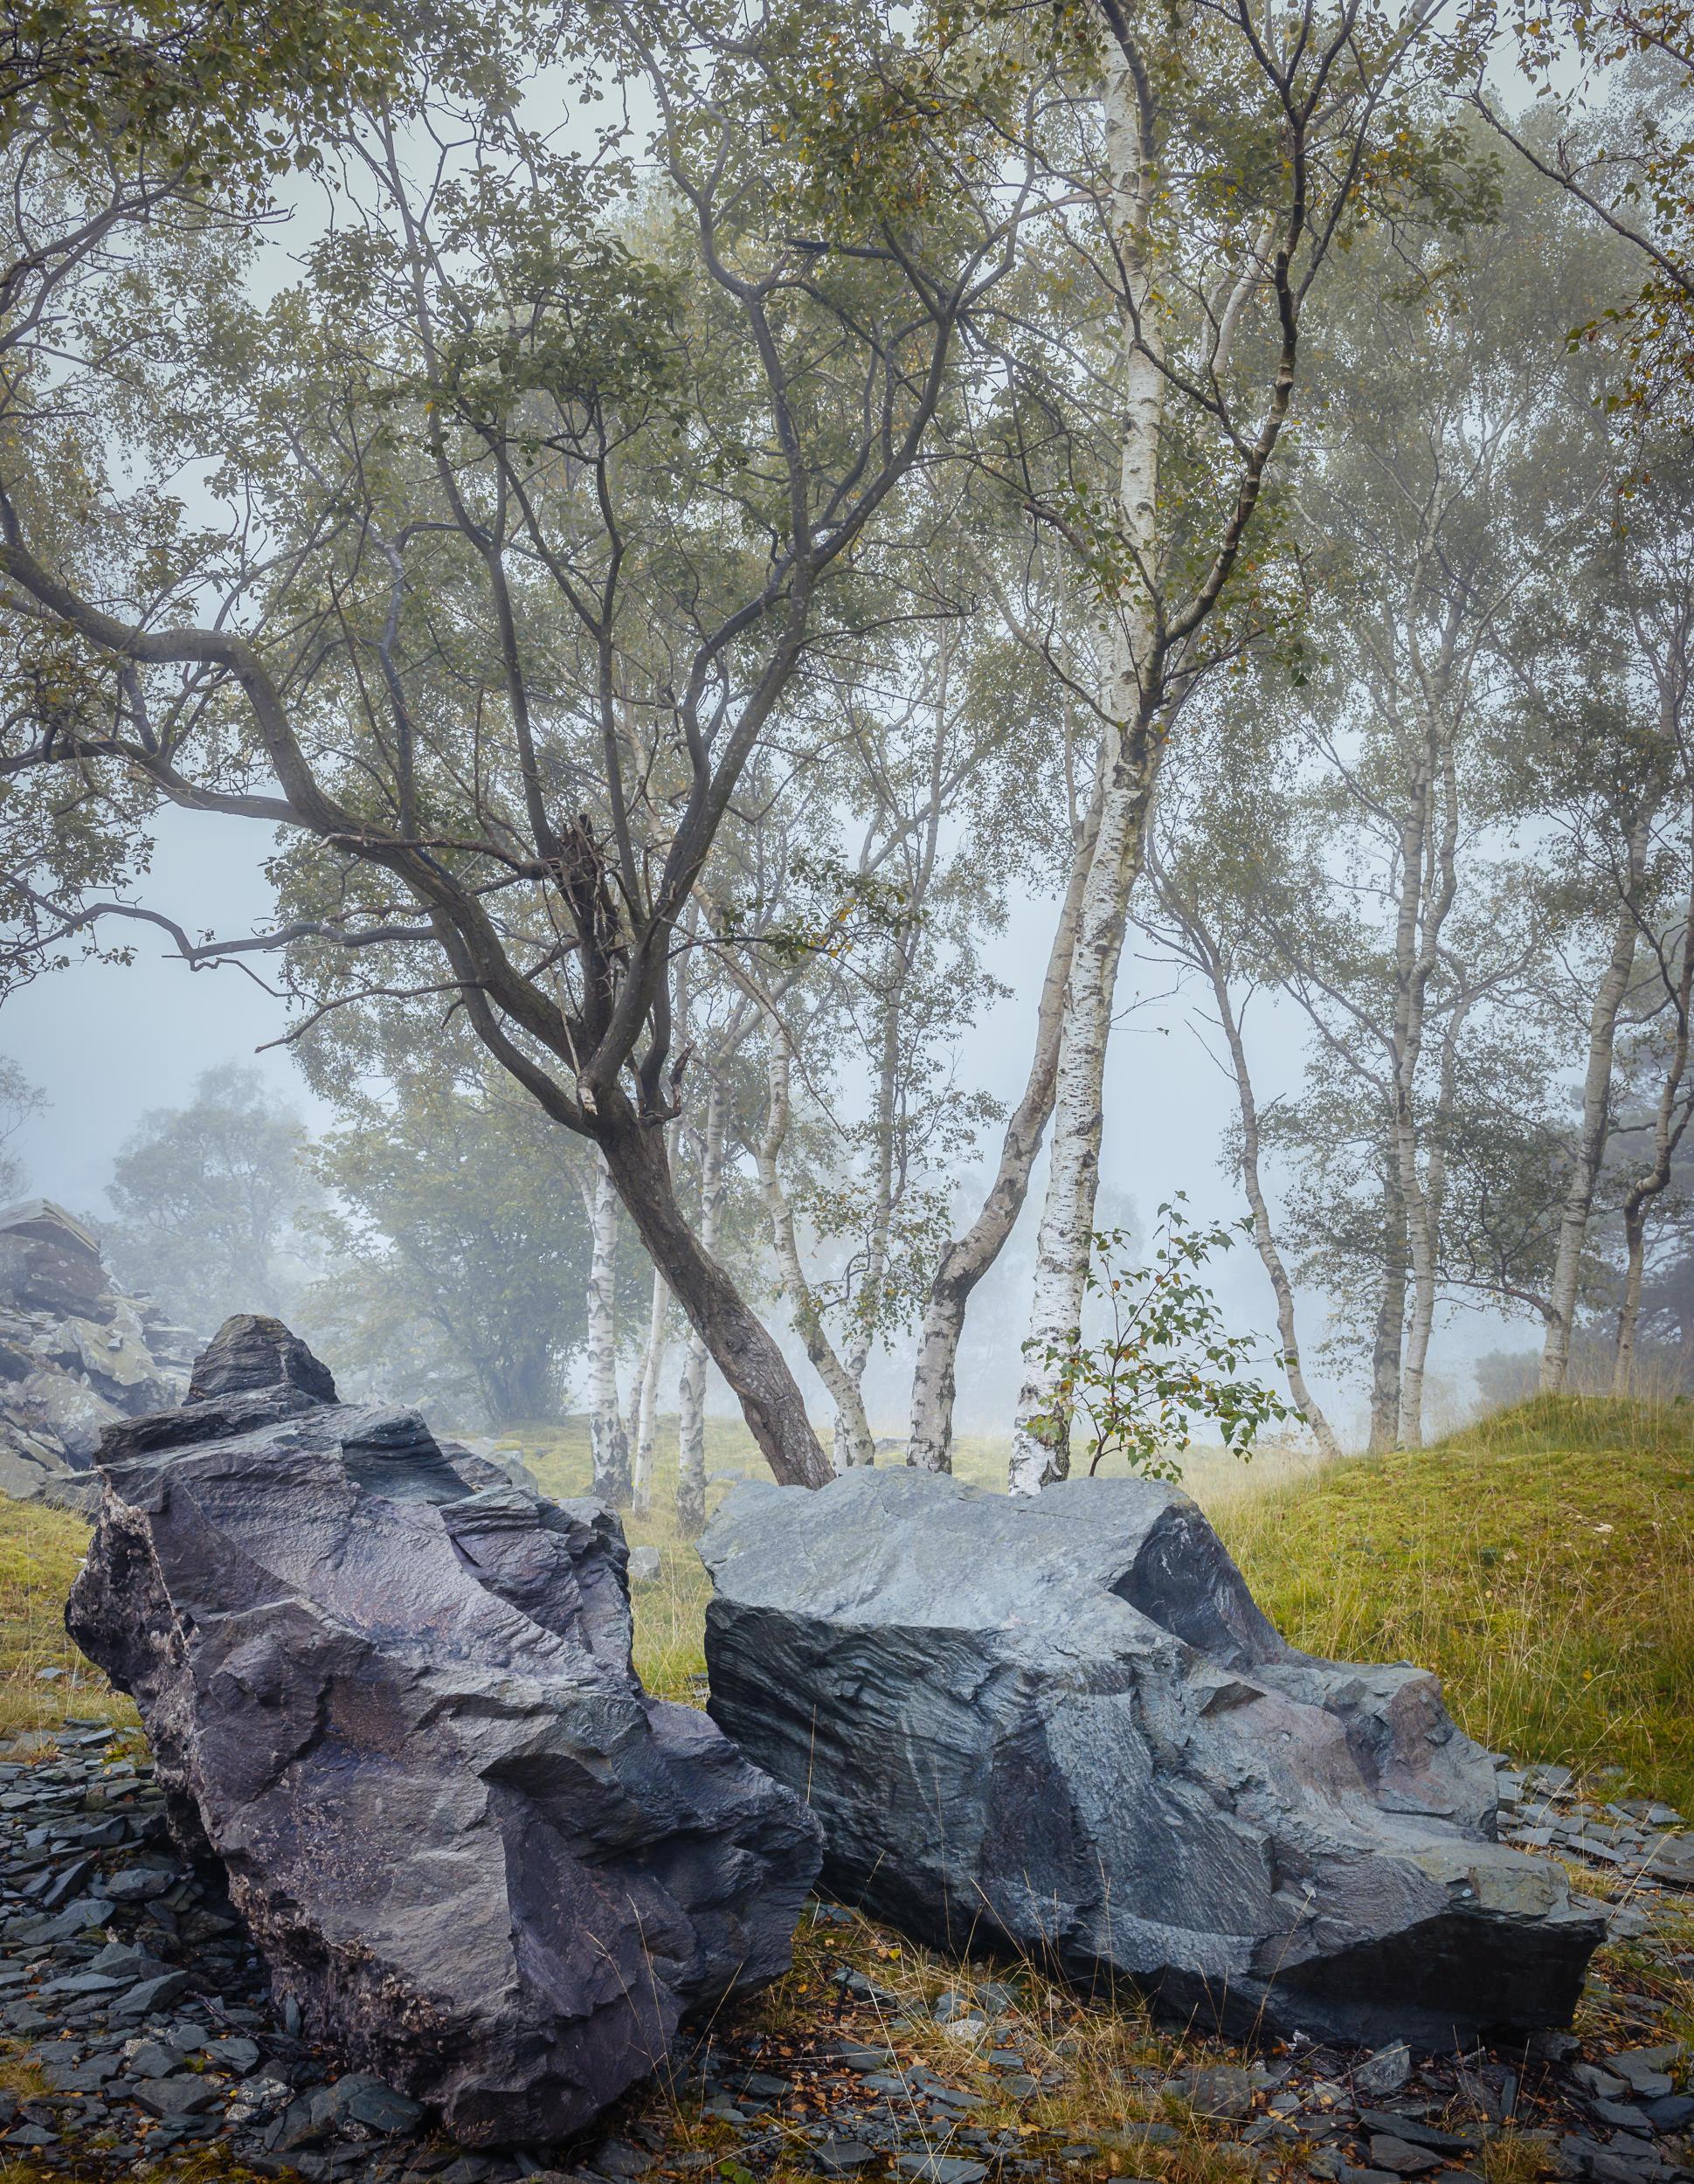 Boulders - Hodge Close